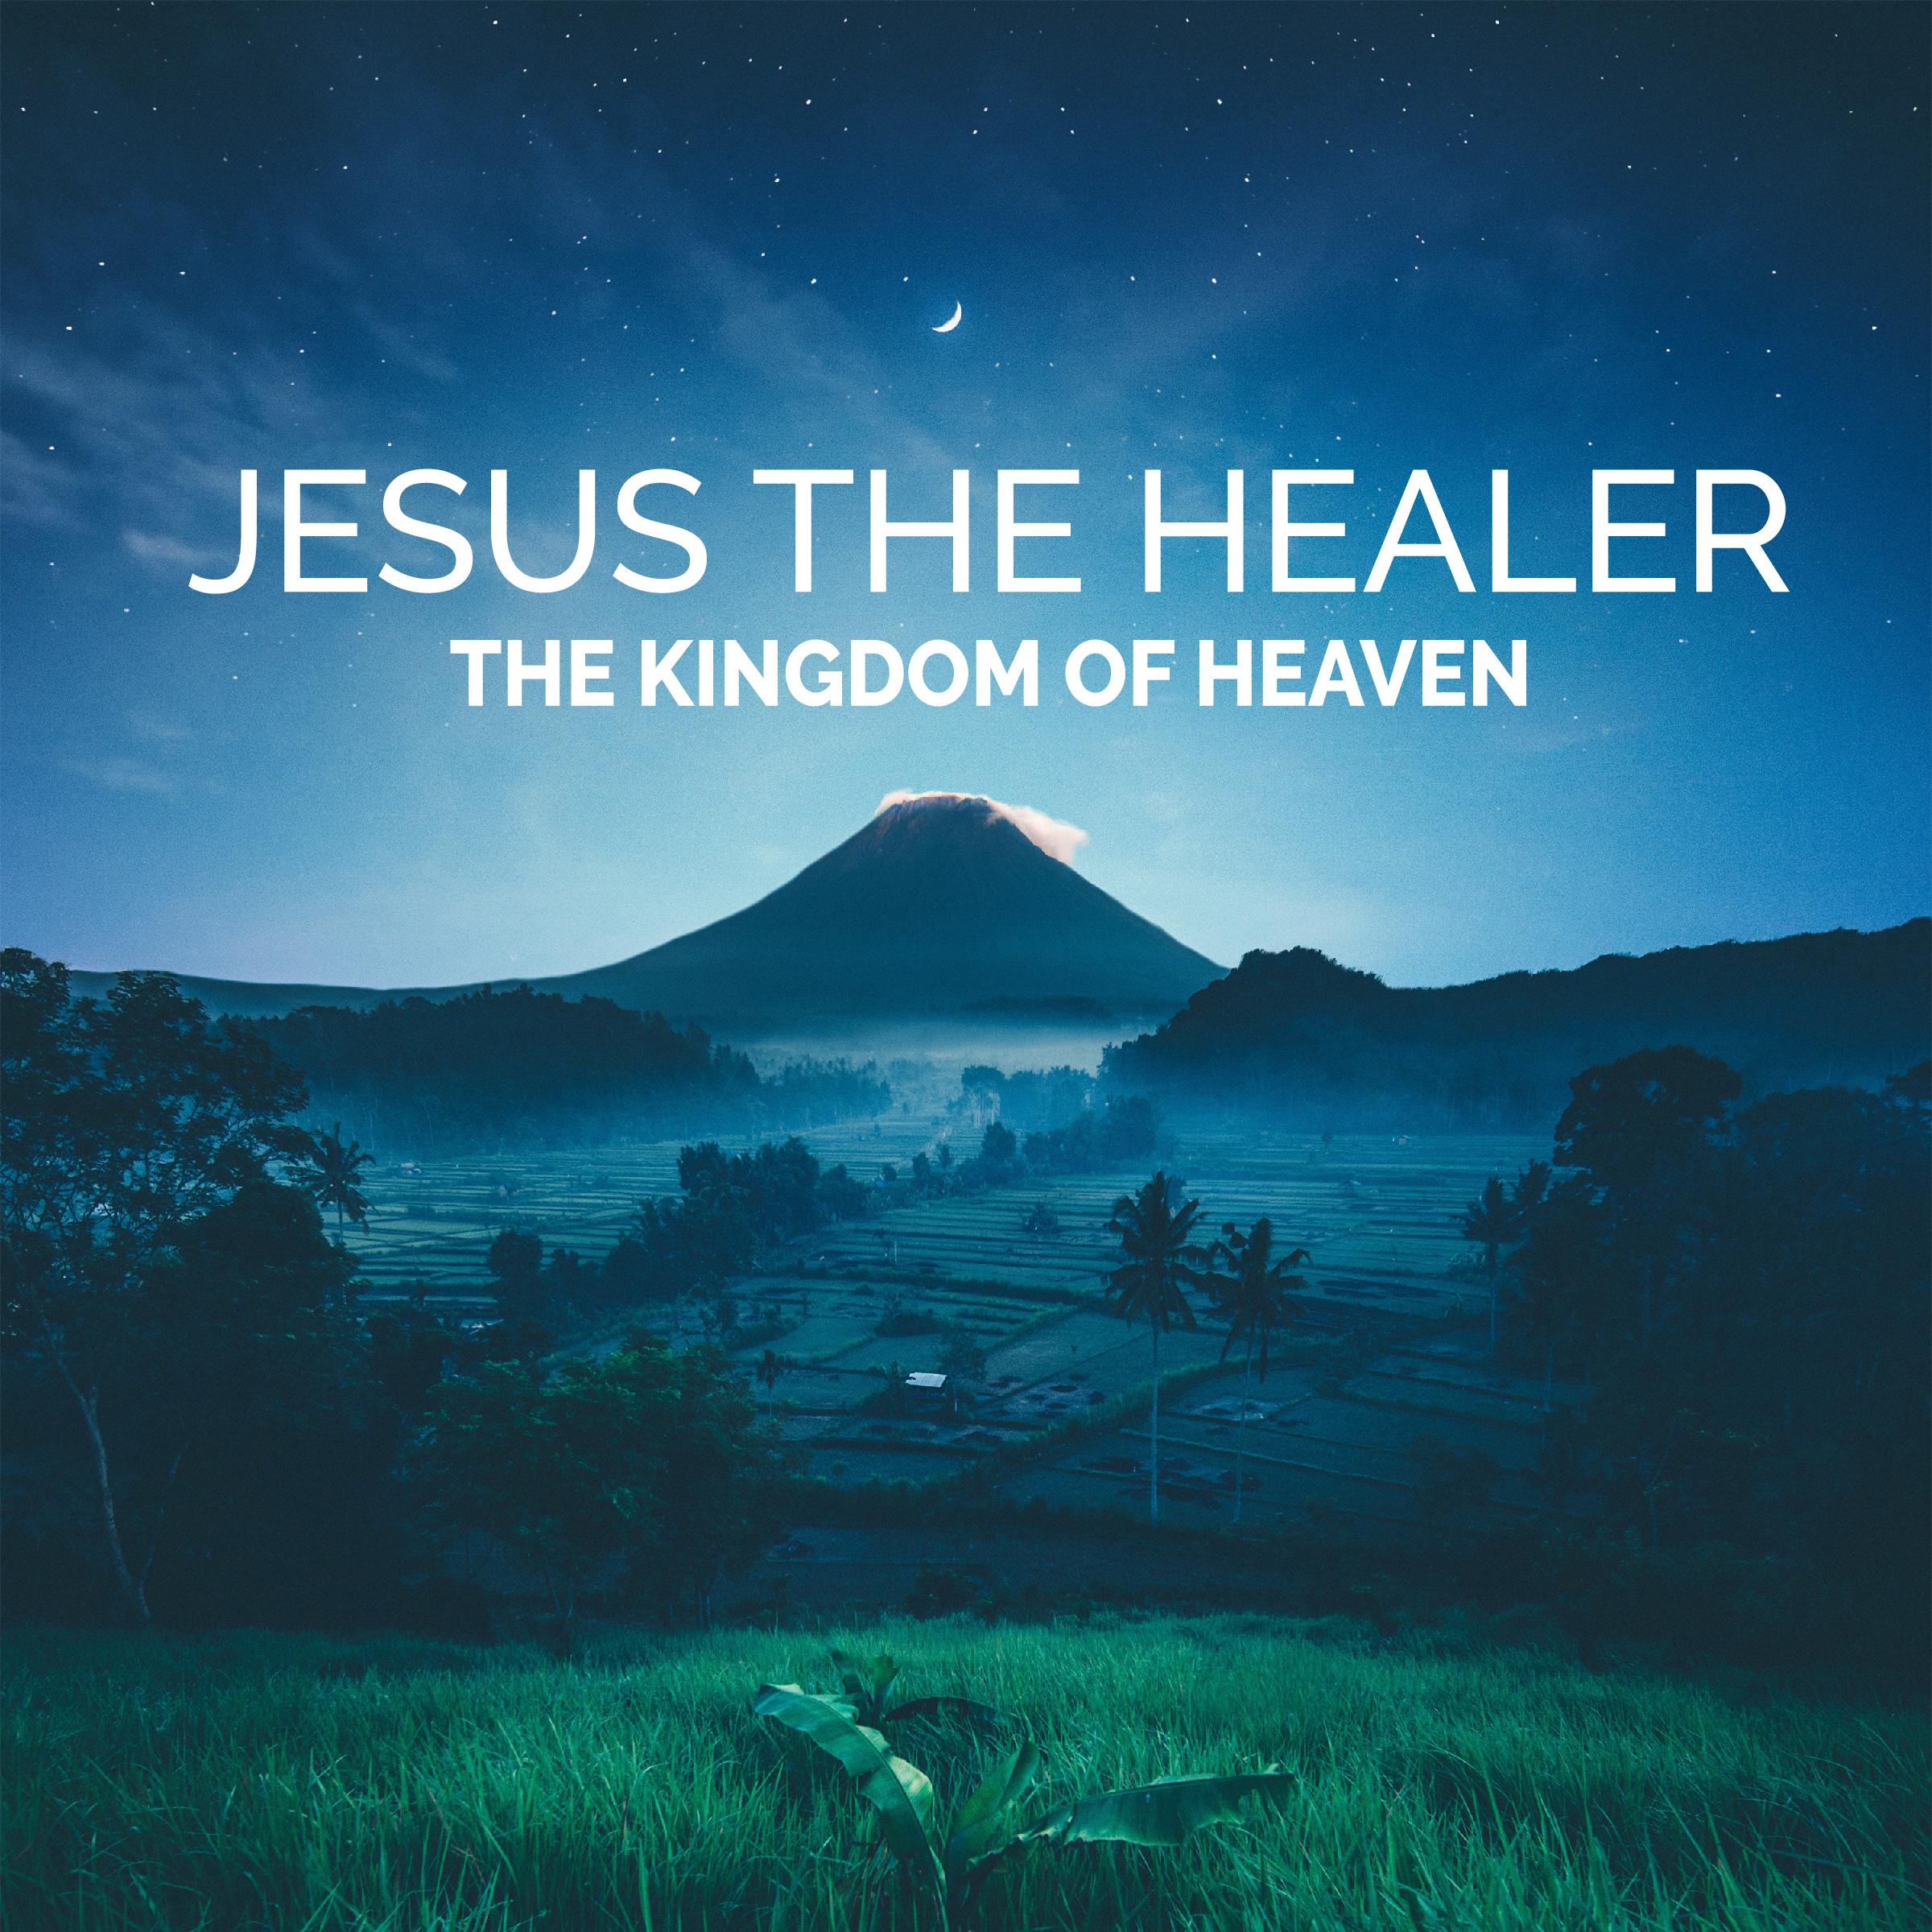 Jesus the Healer Kingdom of Heaven